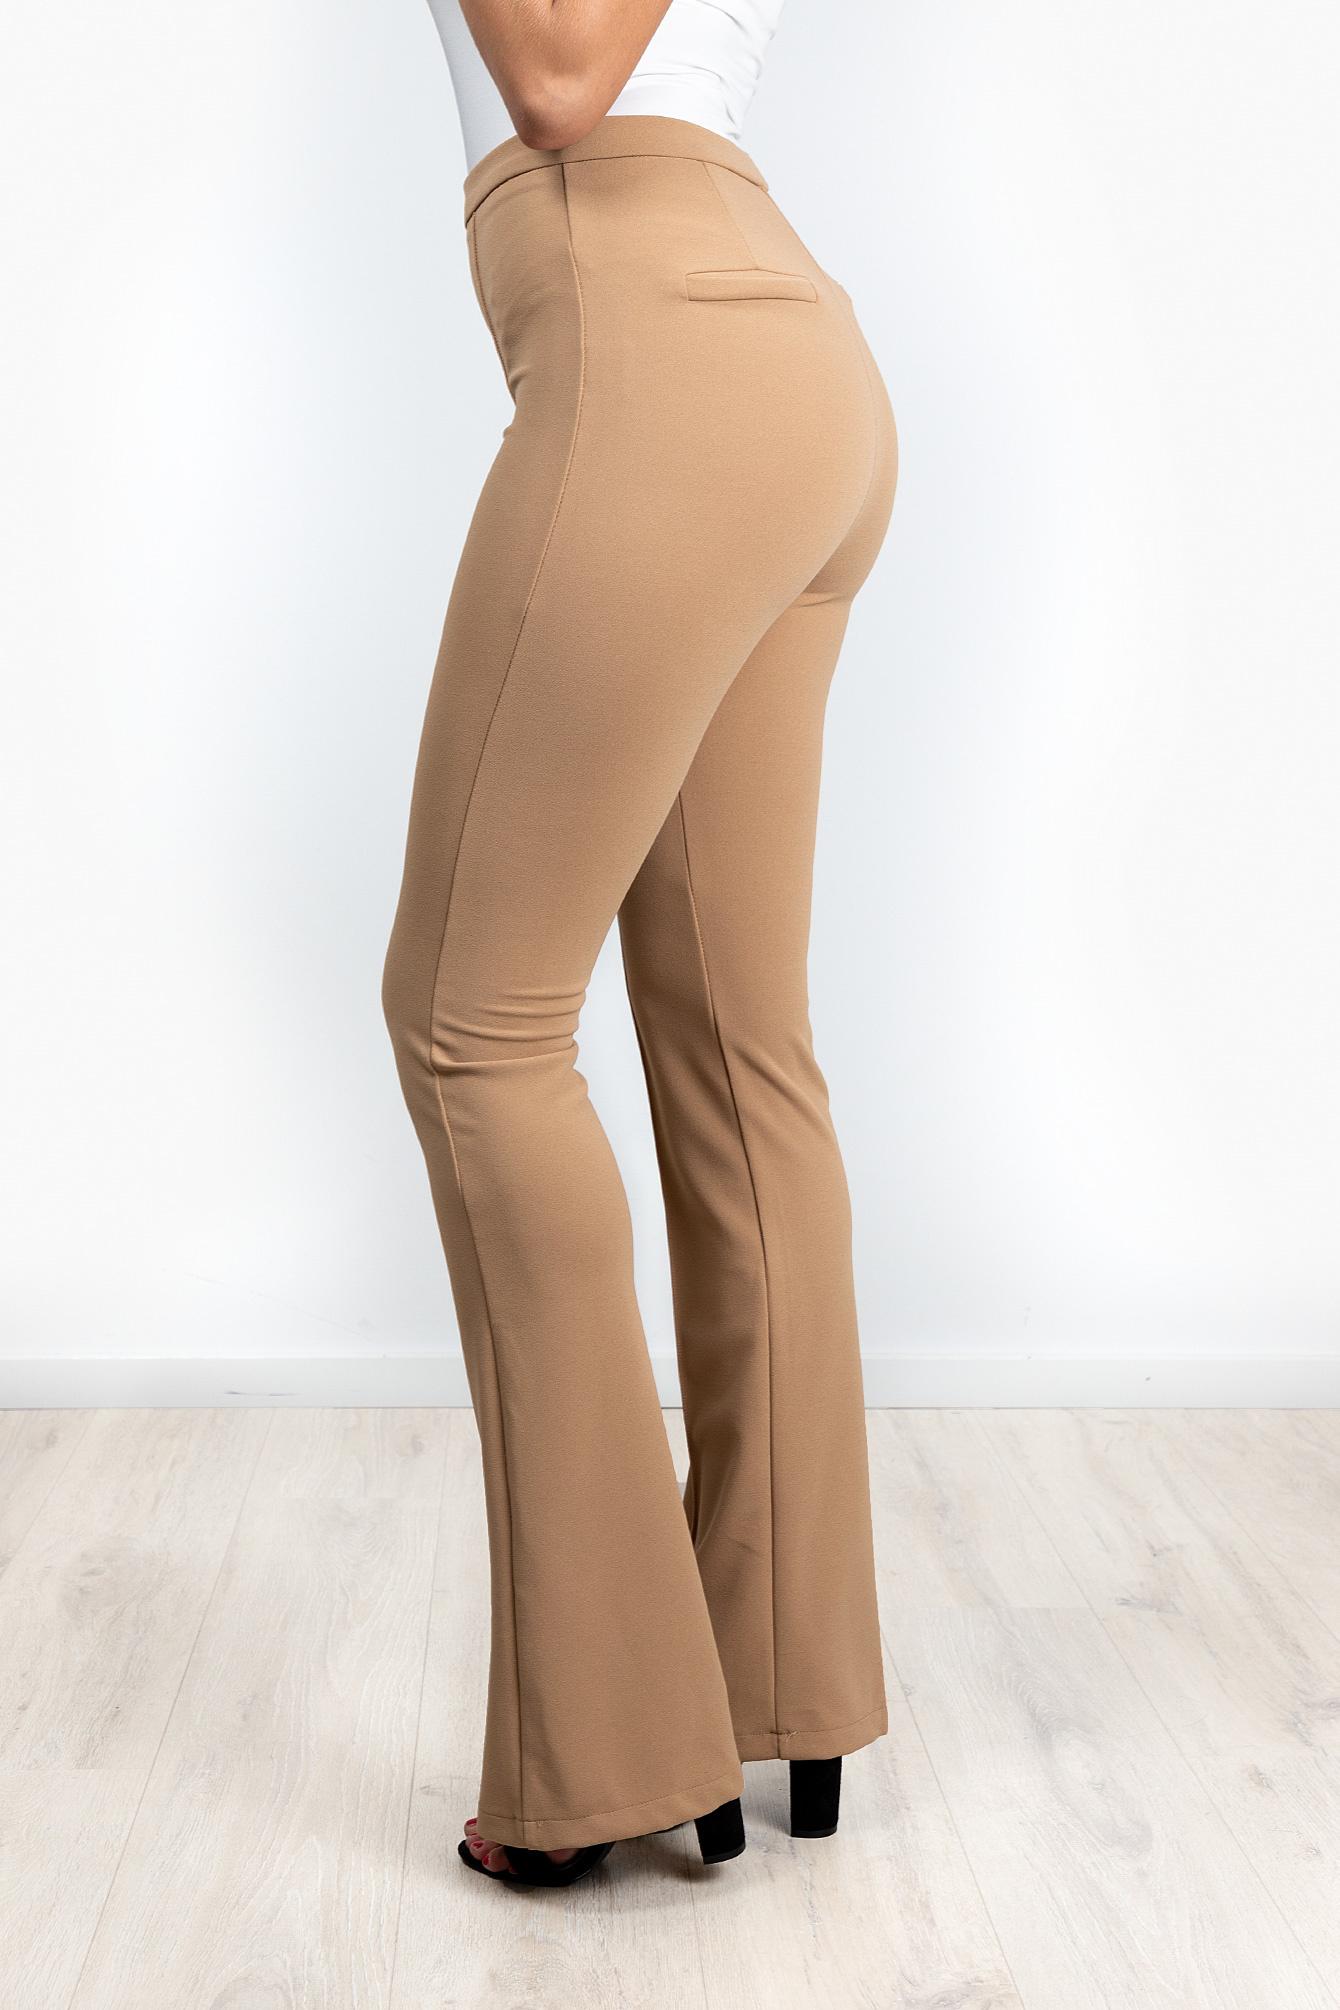 Flare broek Everly beige